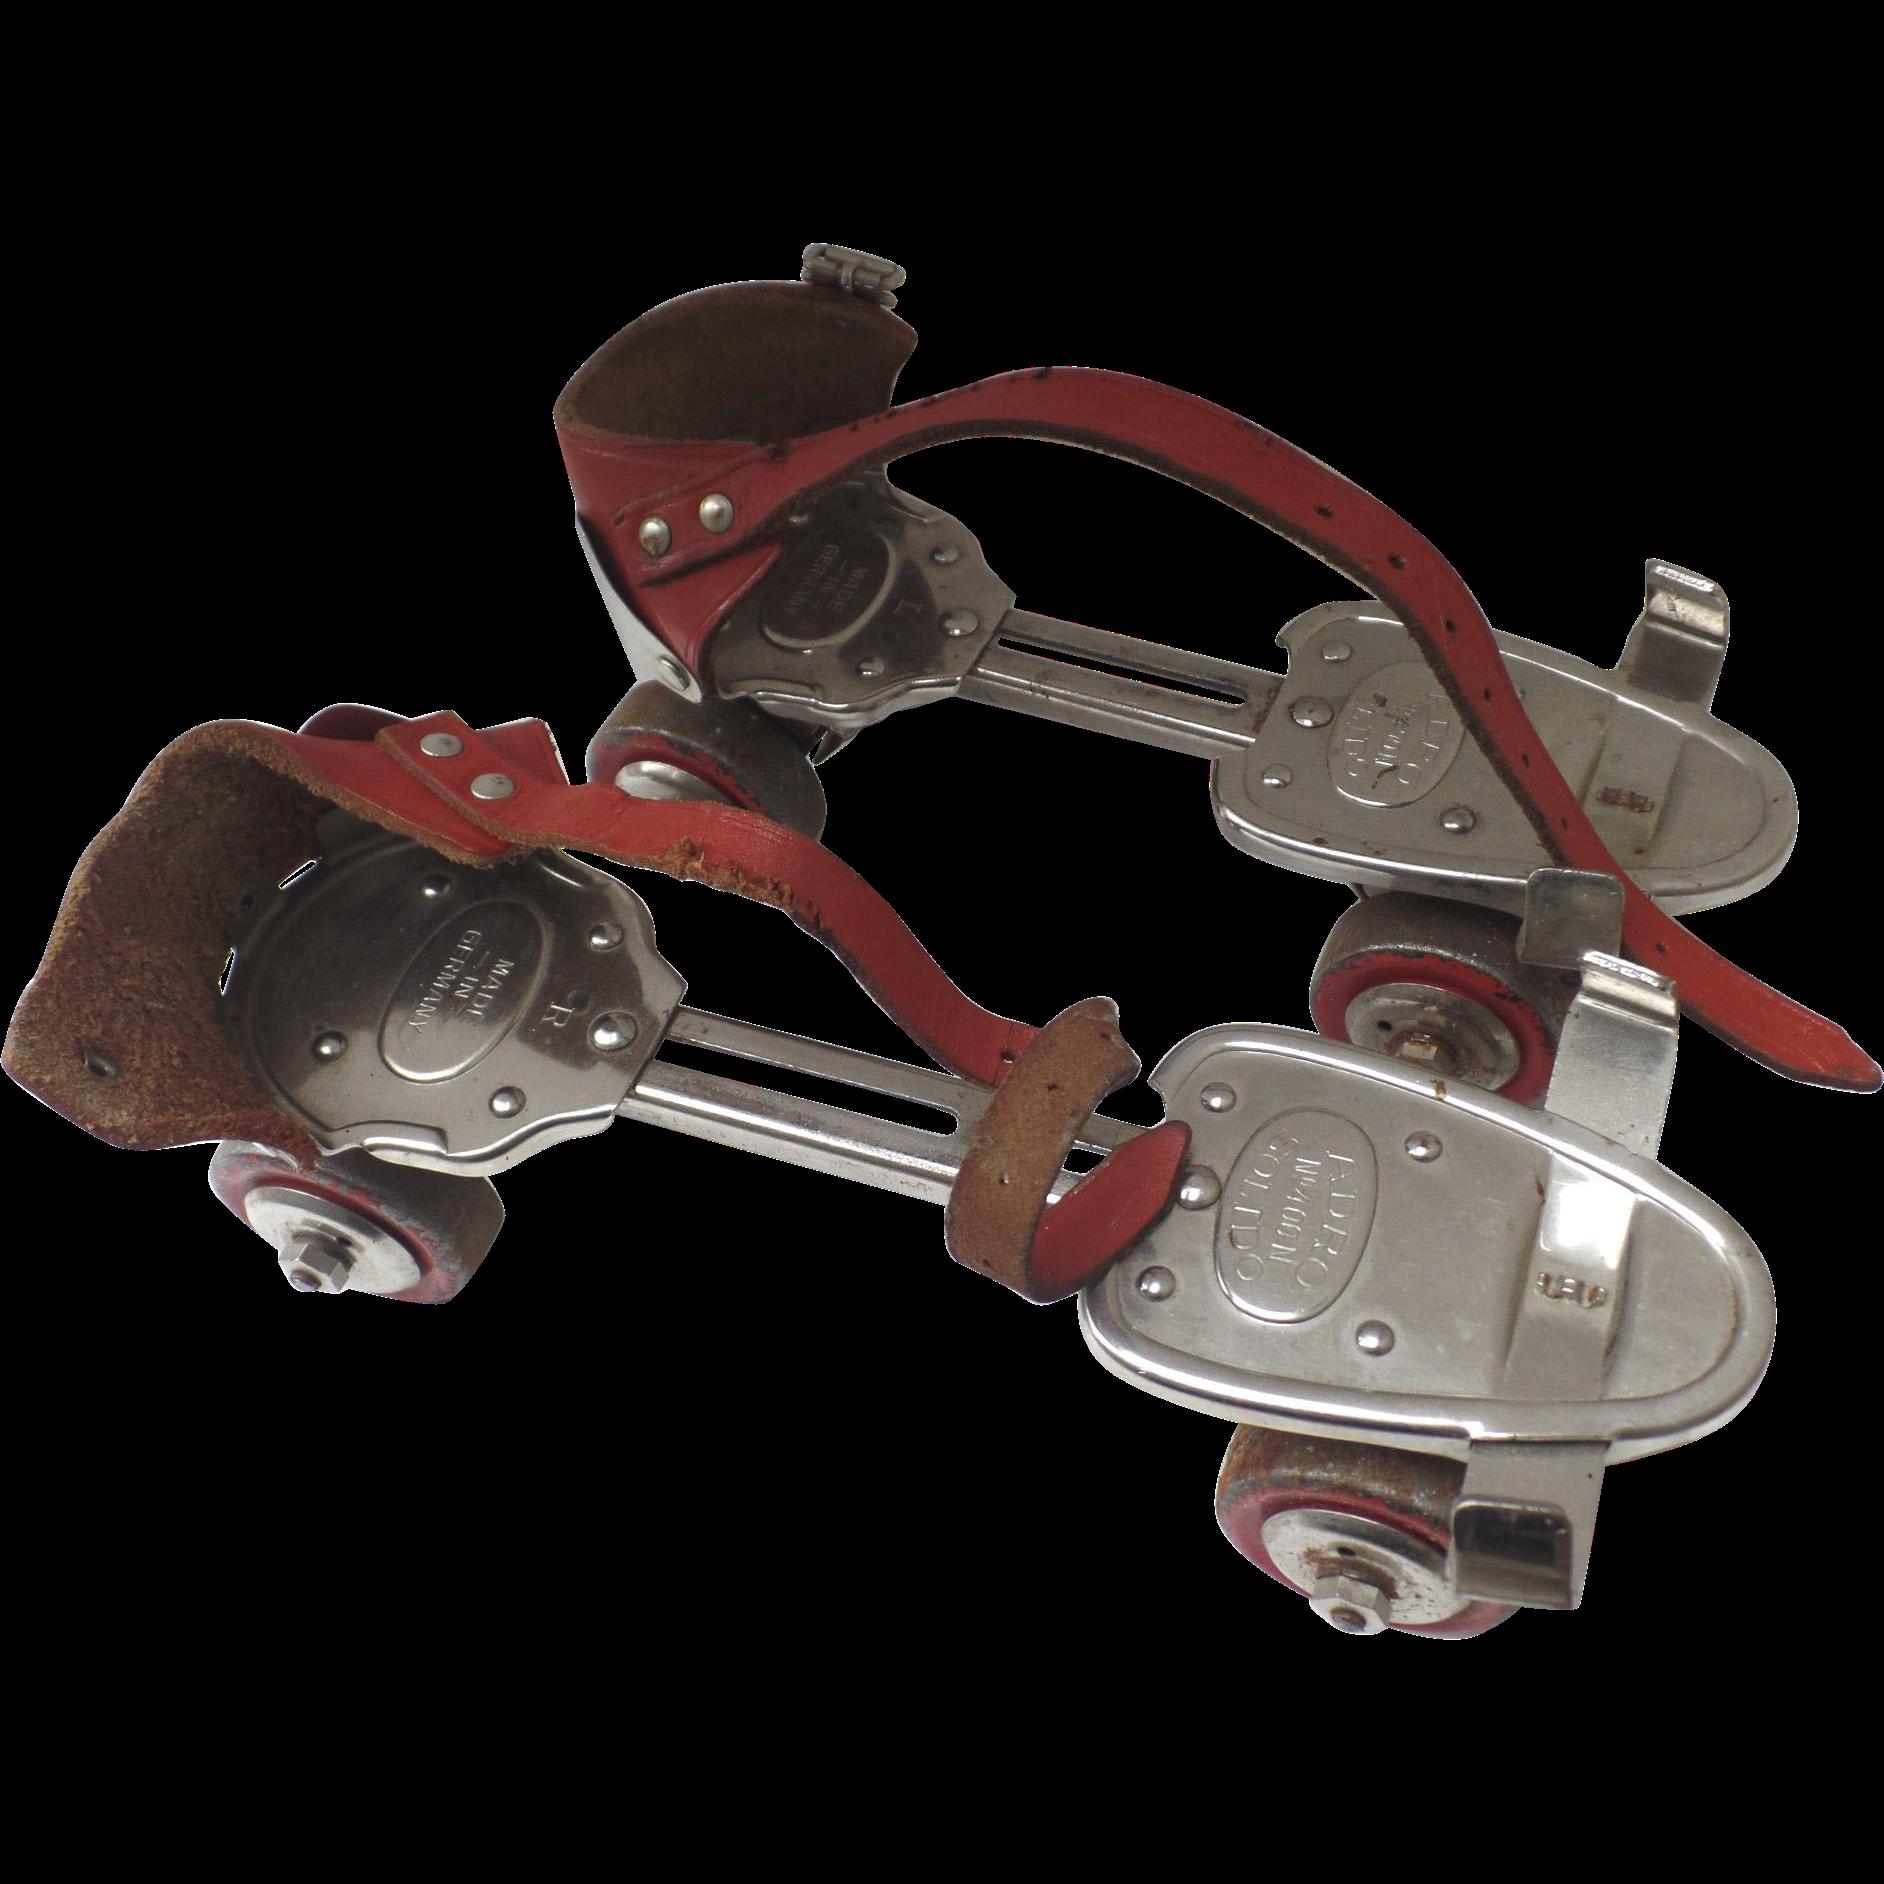 Roller skates vintage - Vintage Adro Solido Made In Germany Roller Skates Red Leather Straps